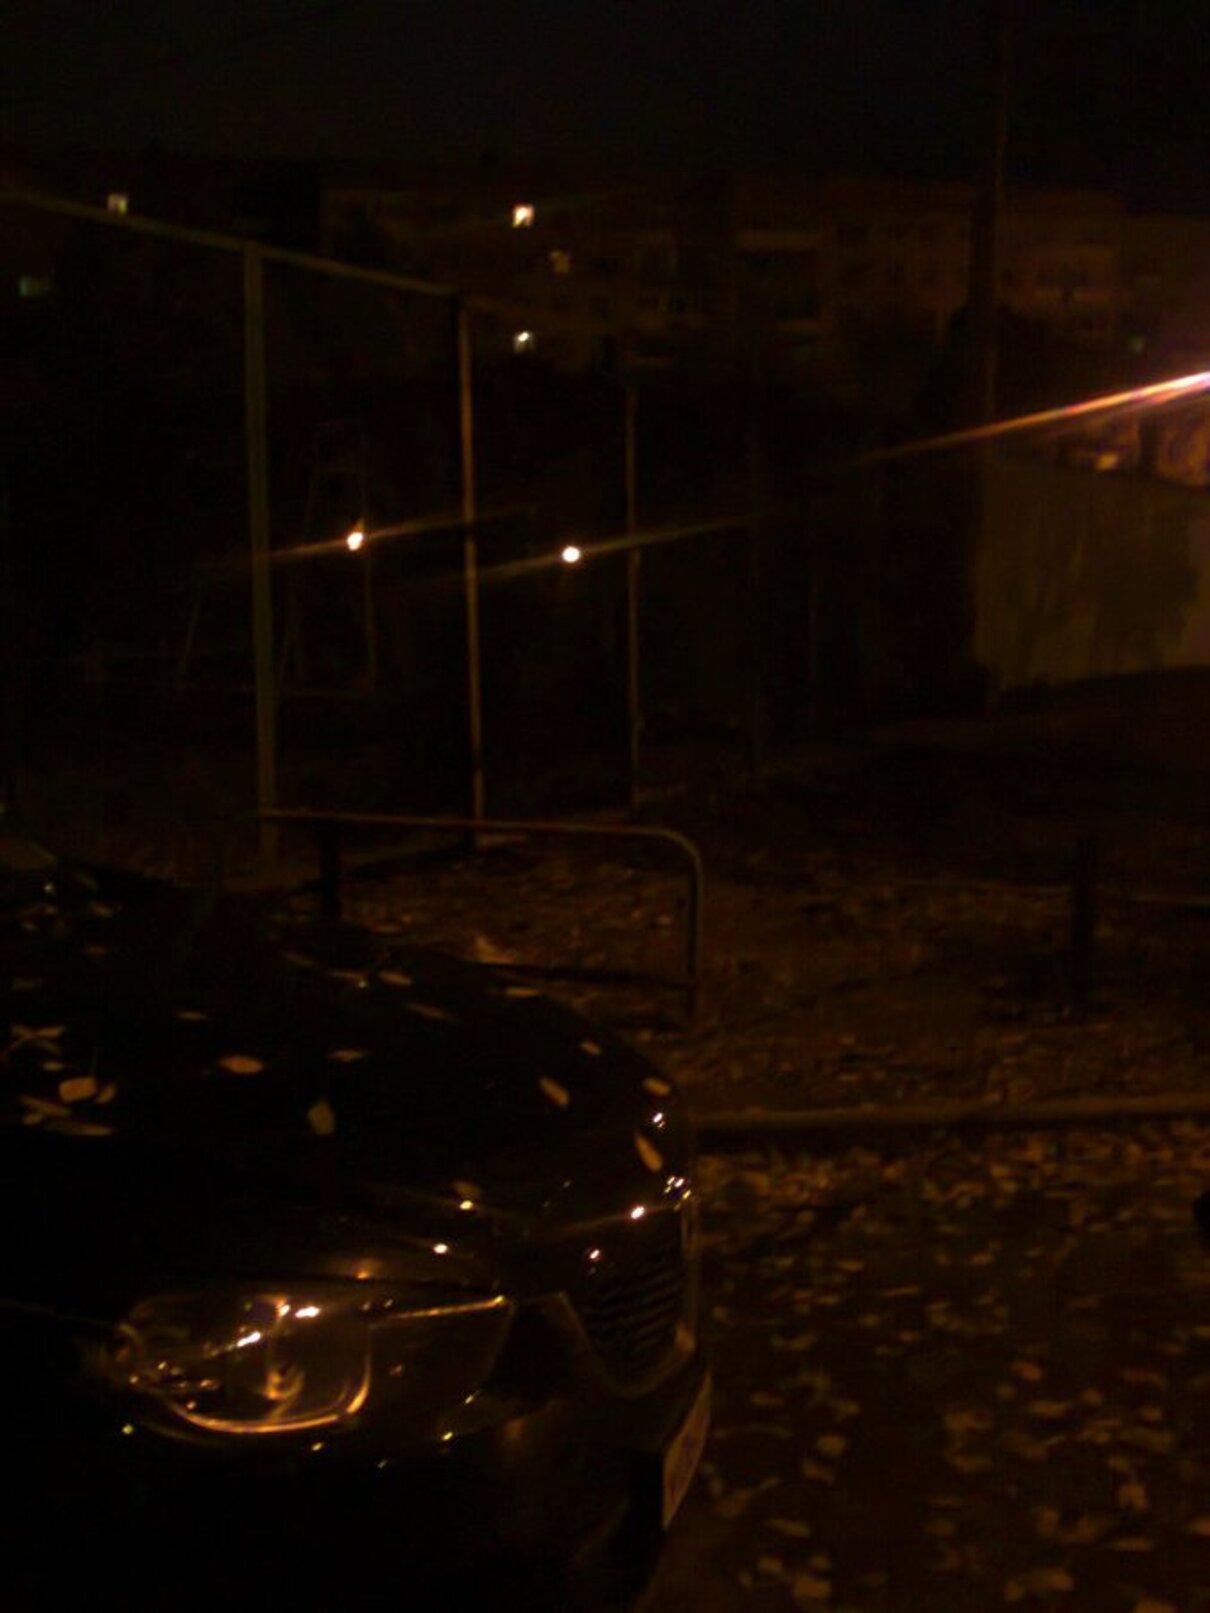 Жалоба-отзыв: ДЮСШ №1 Самара - Ползучий захват общественной земли в Самаре.  Фото №1